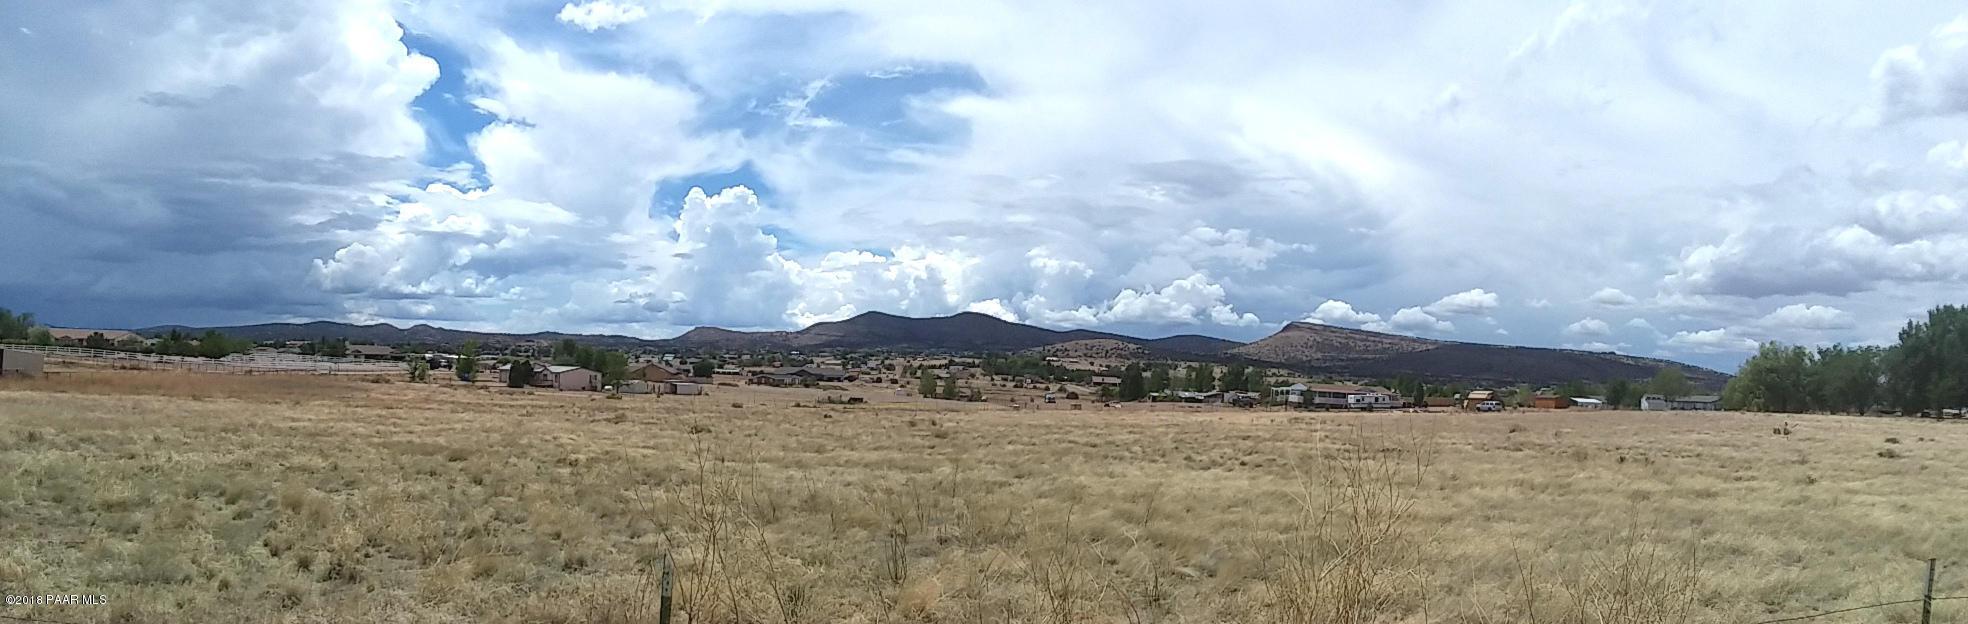 0 N Reed Rd (Lot 3) Chino Valley, AZ 86323 - MLS #: 1013802